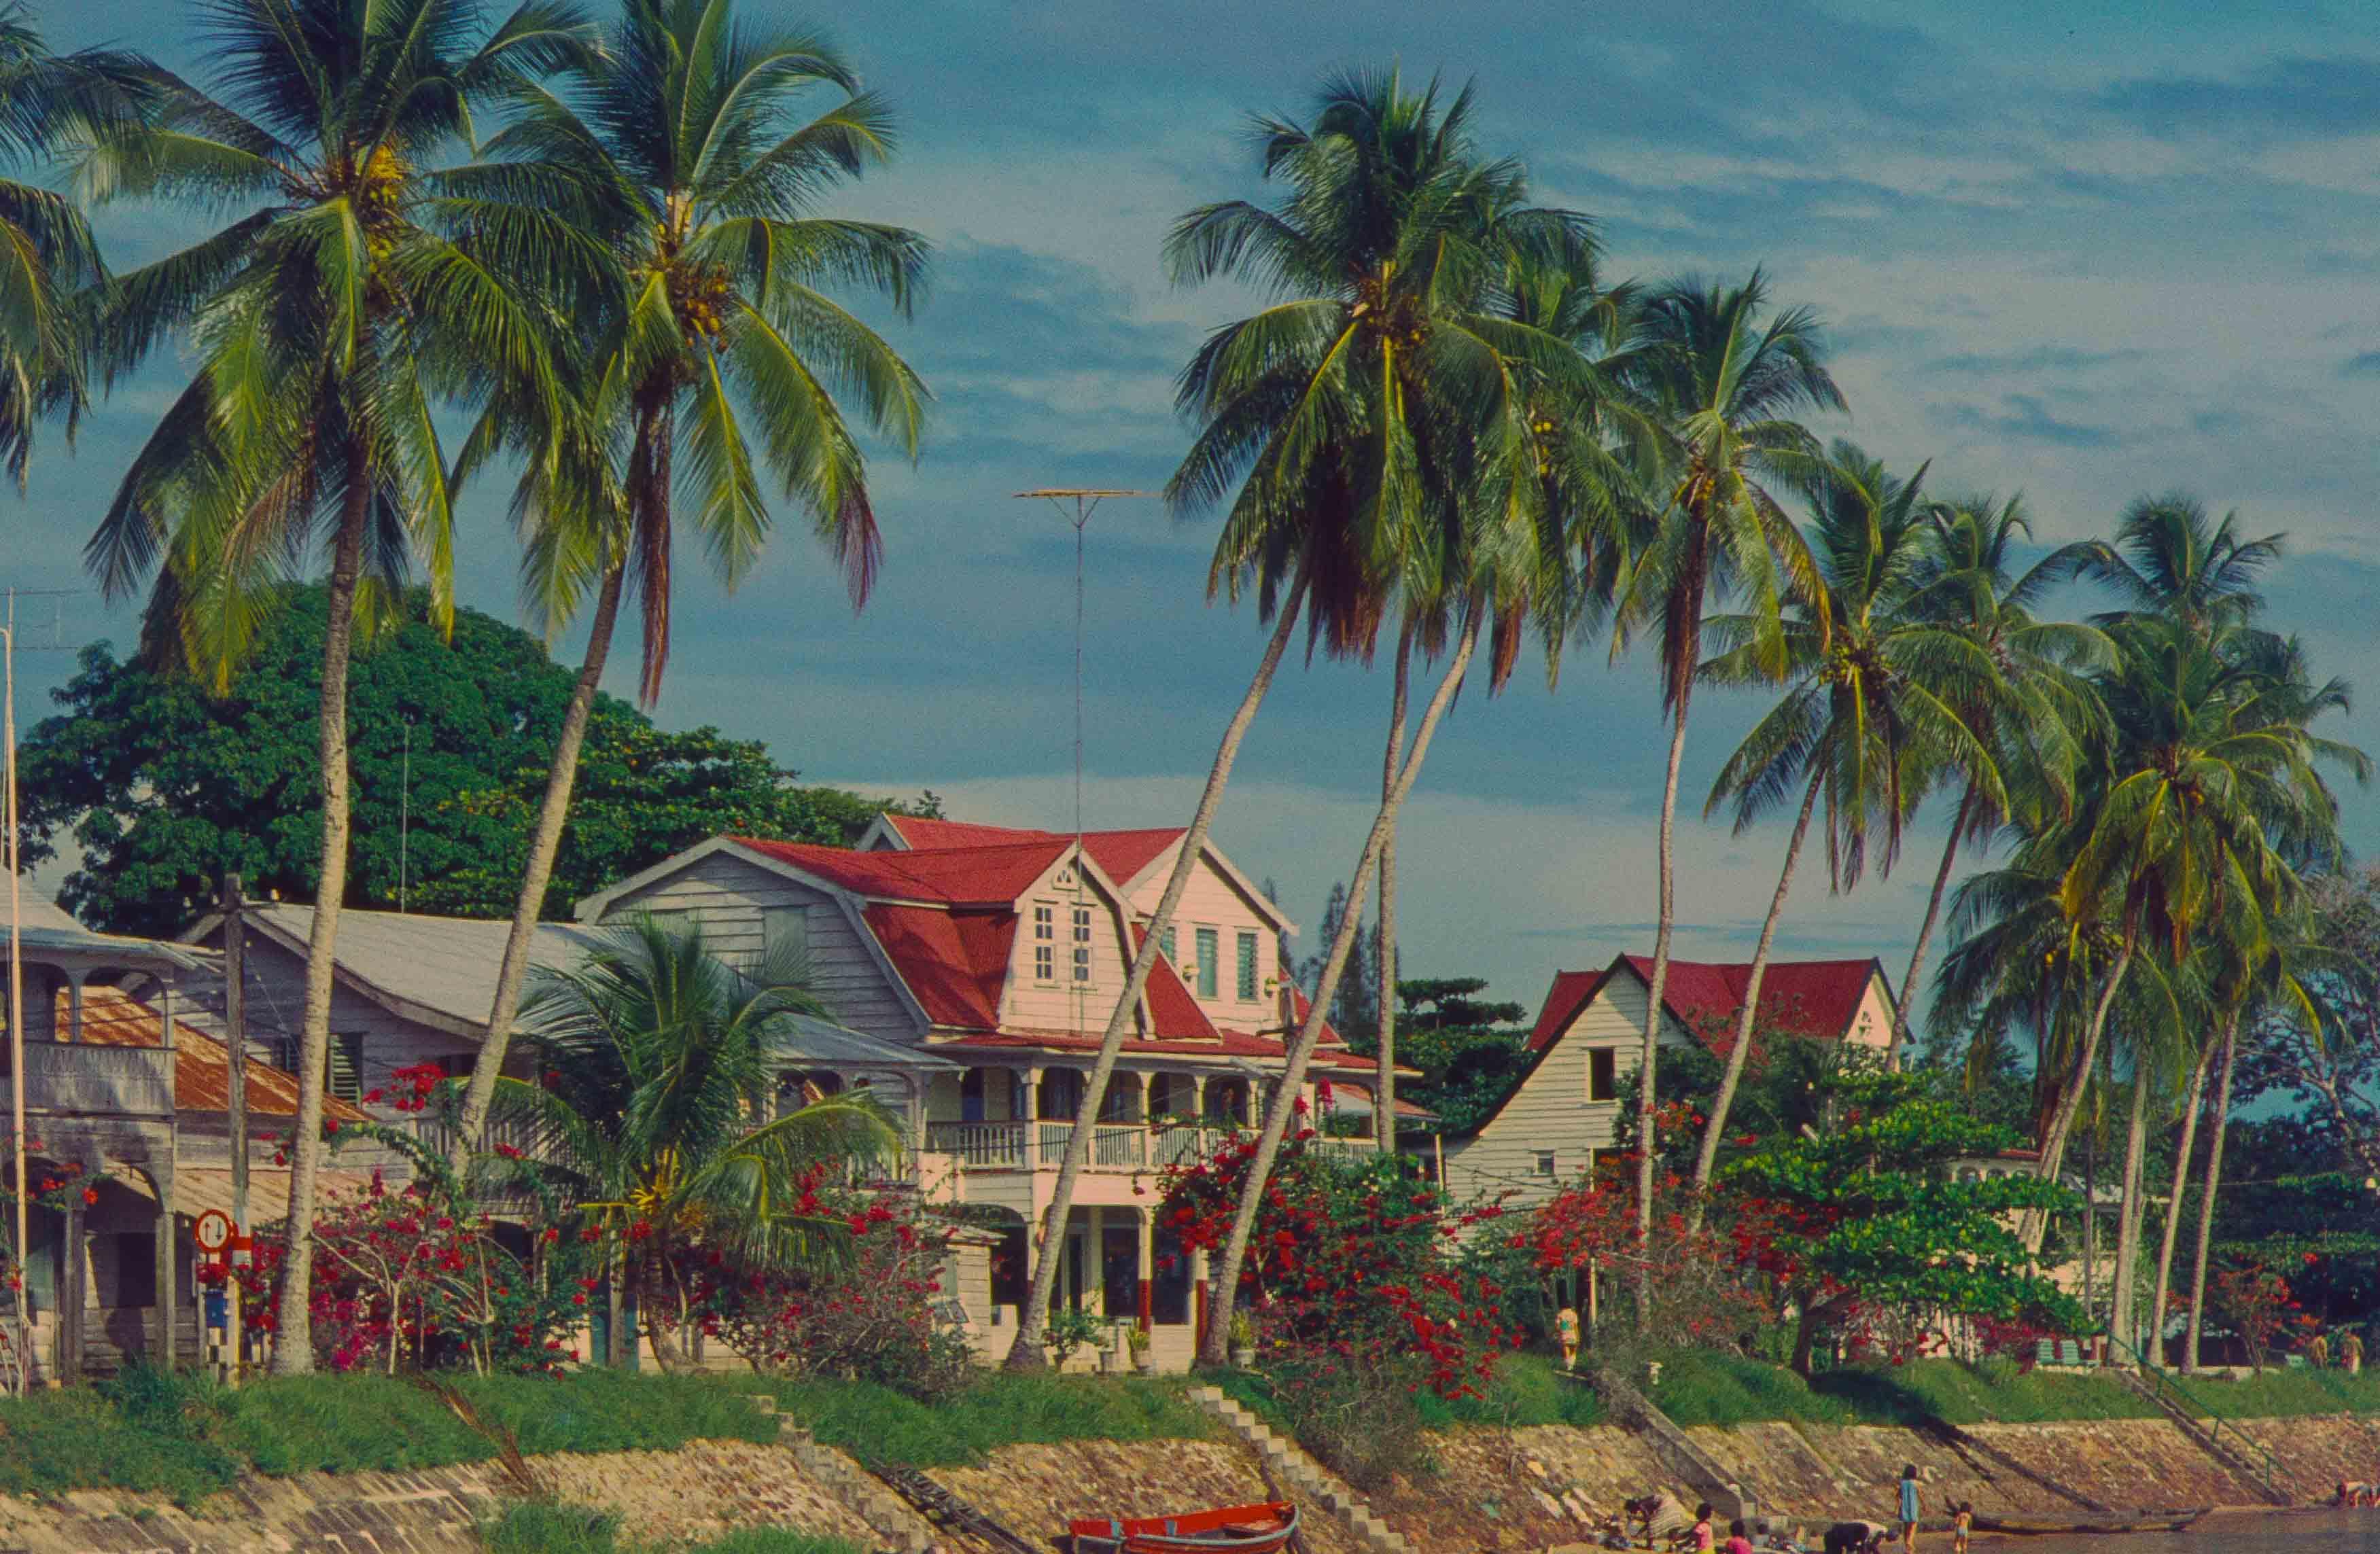 383. Suriname